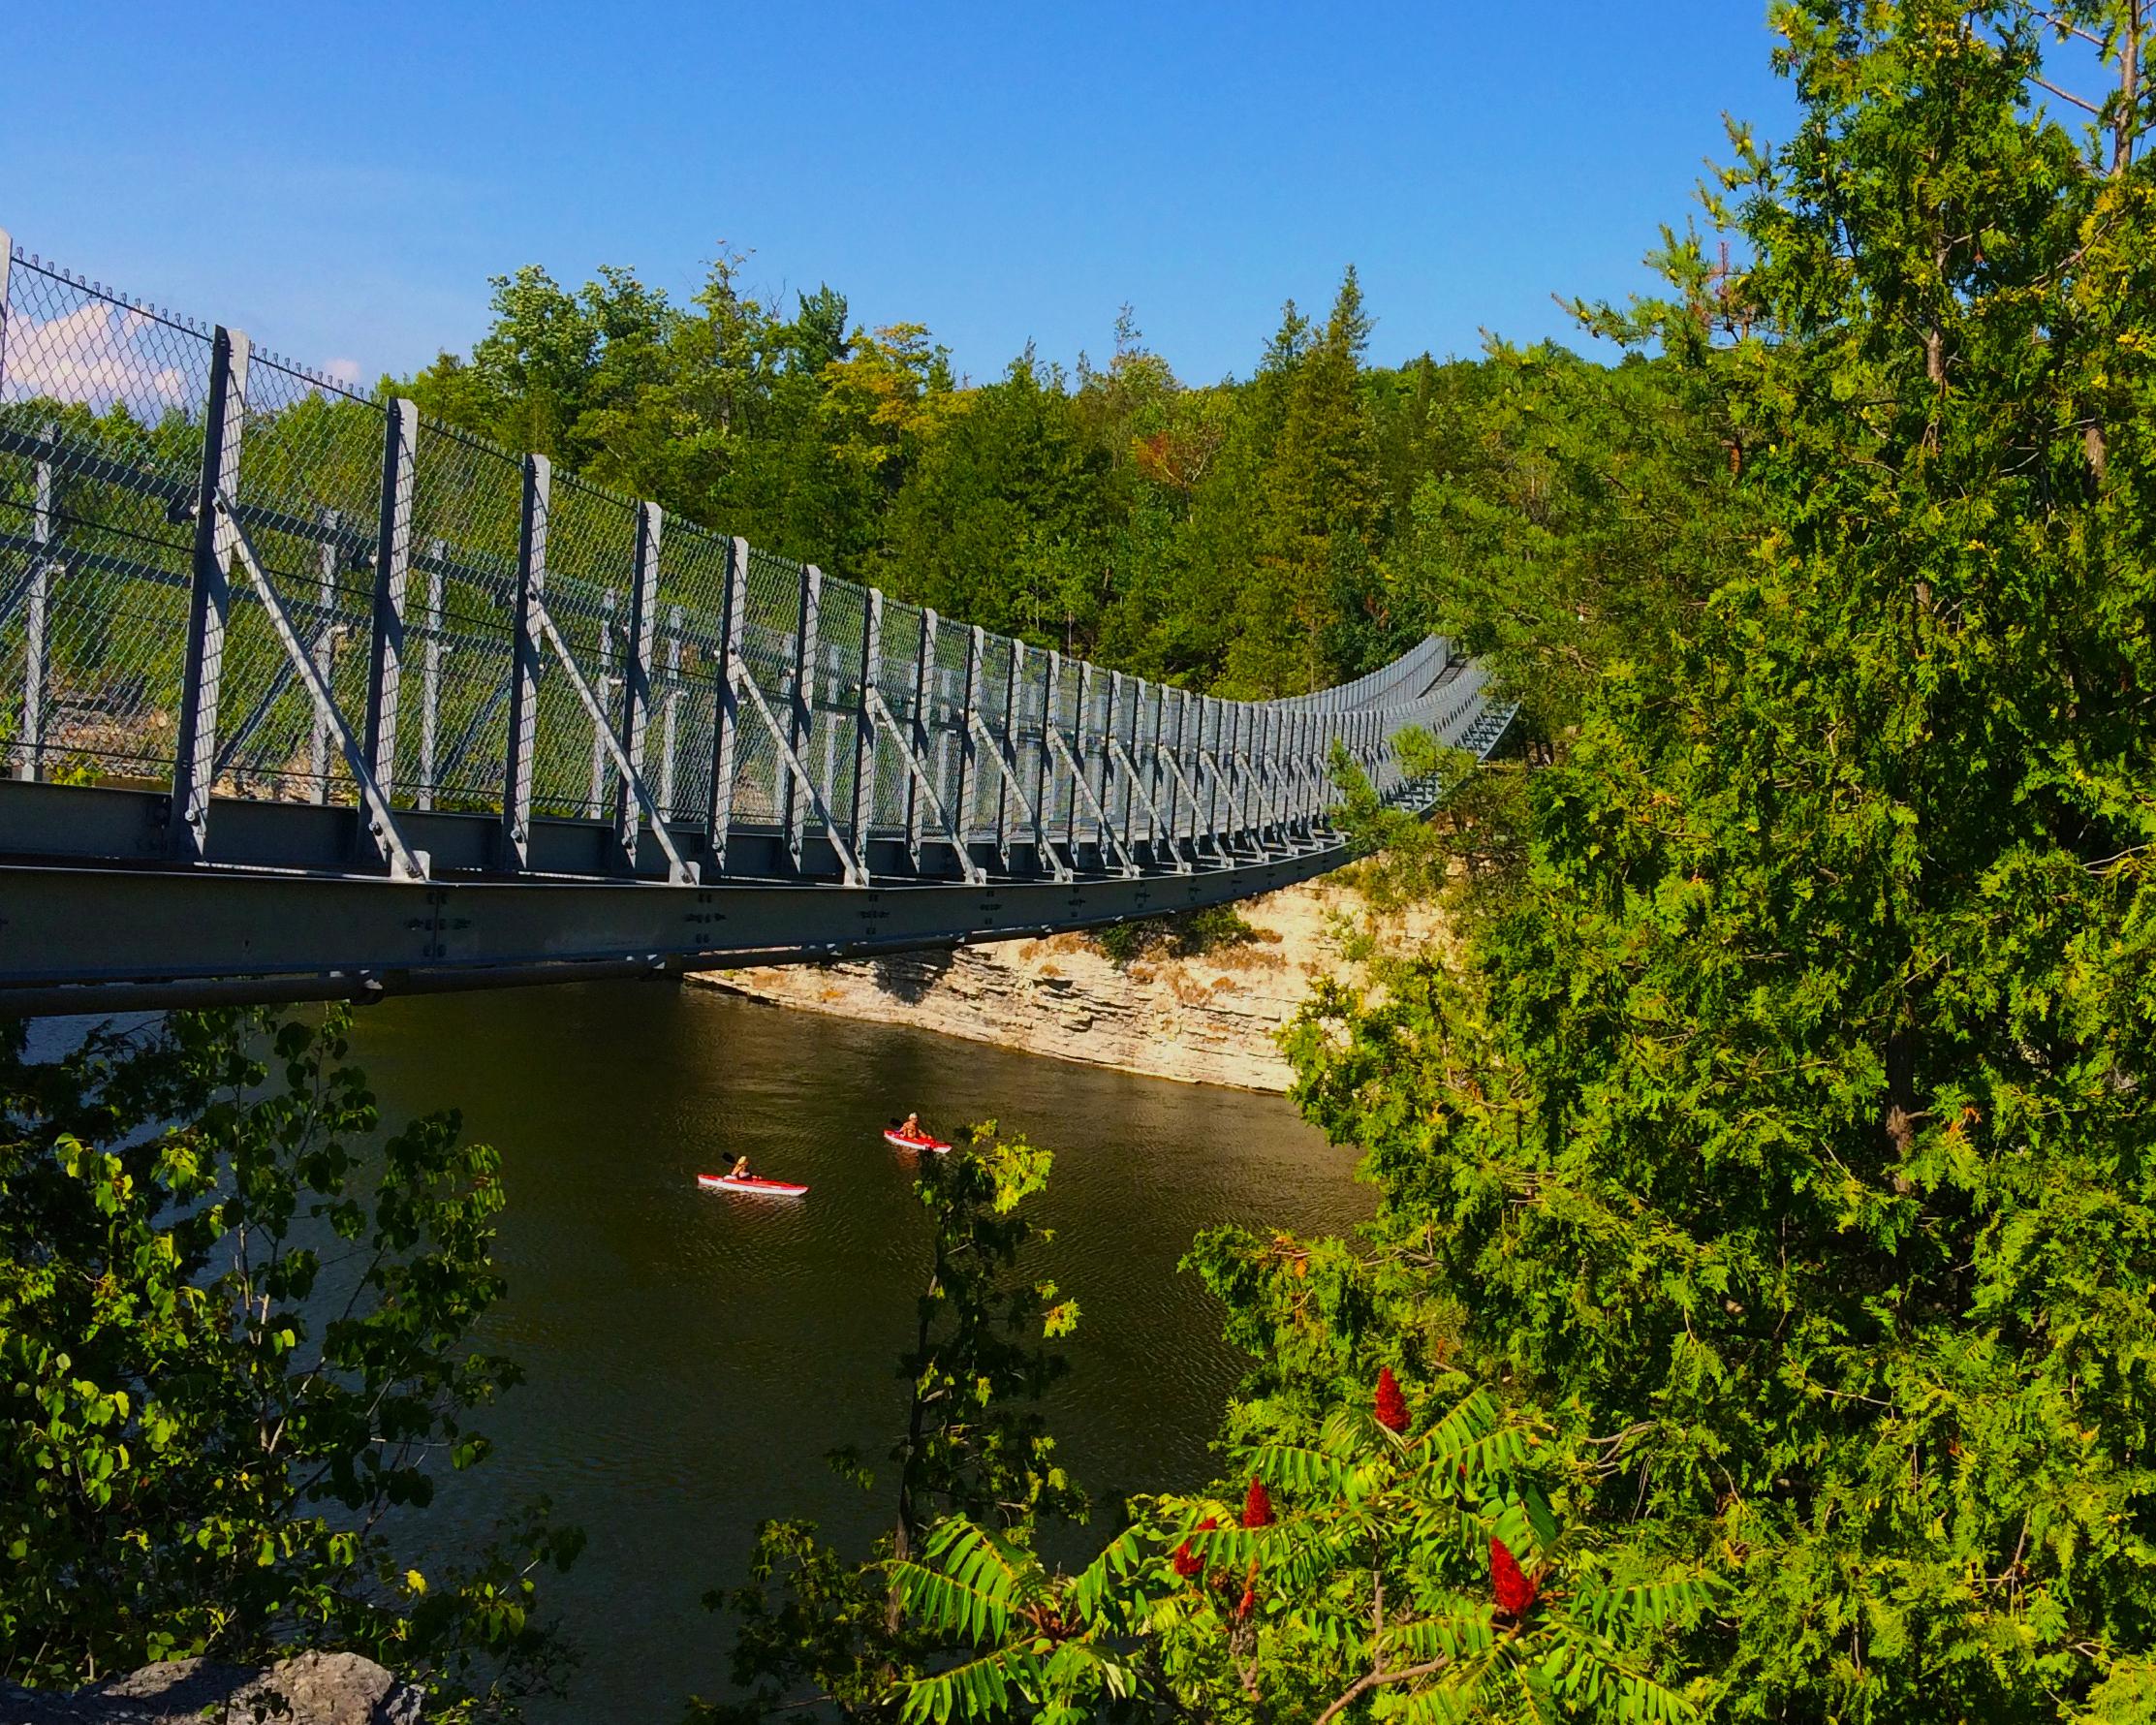 Ferris Provincial Park Rv Camping Review Rv Places To Go